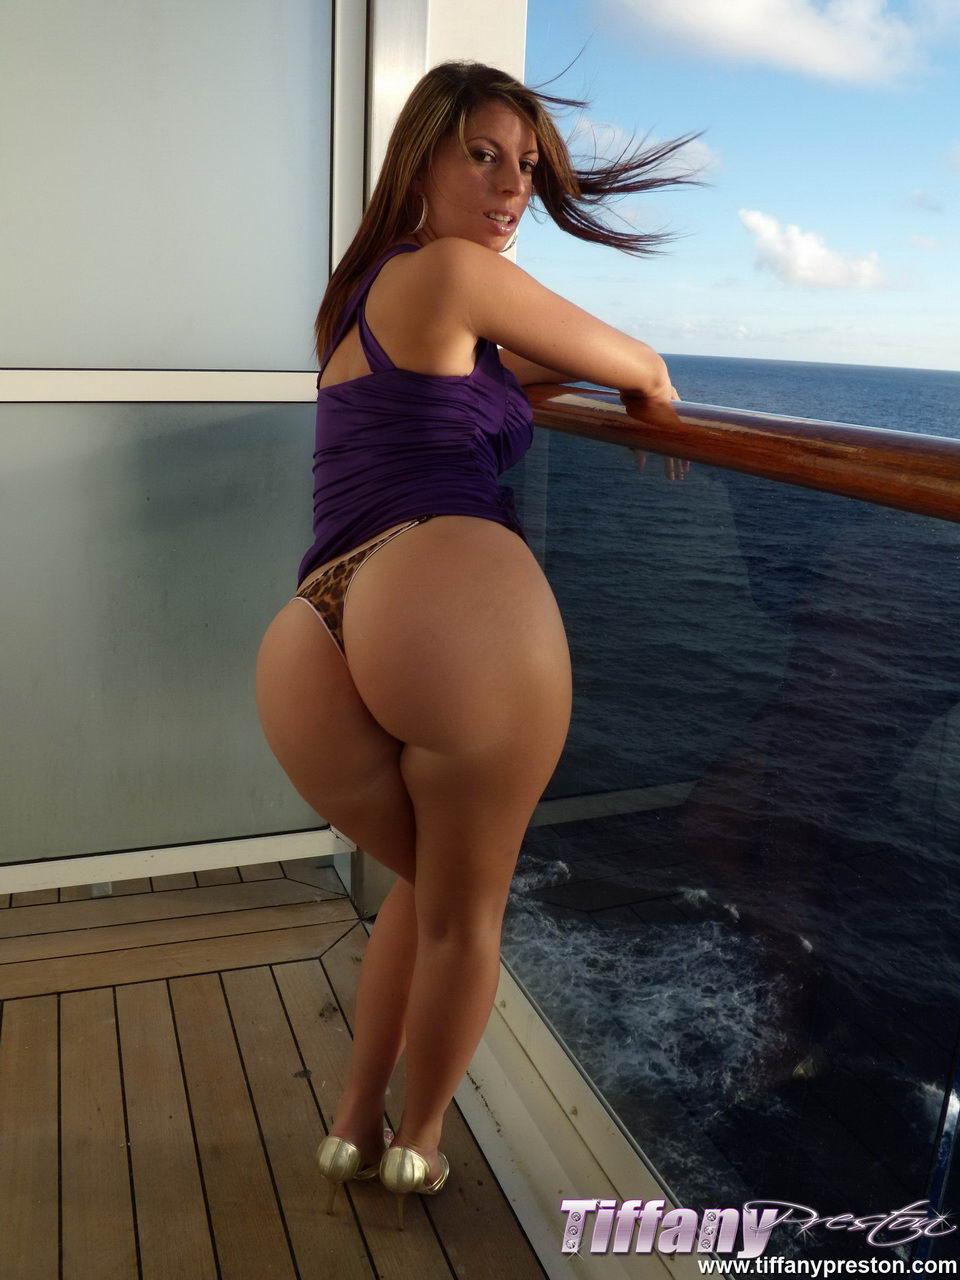 Tiffany preston booty